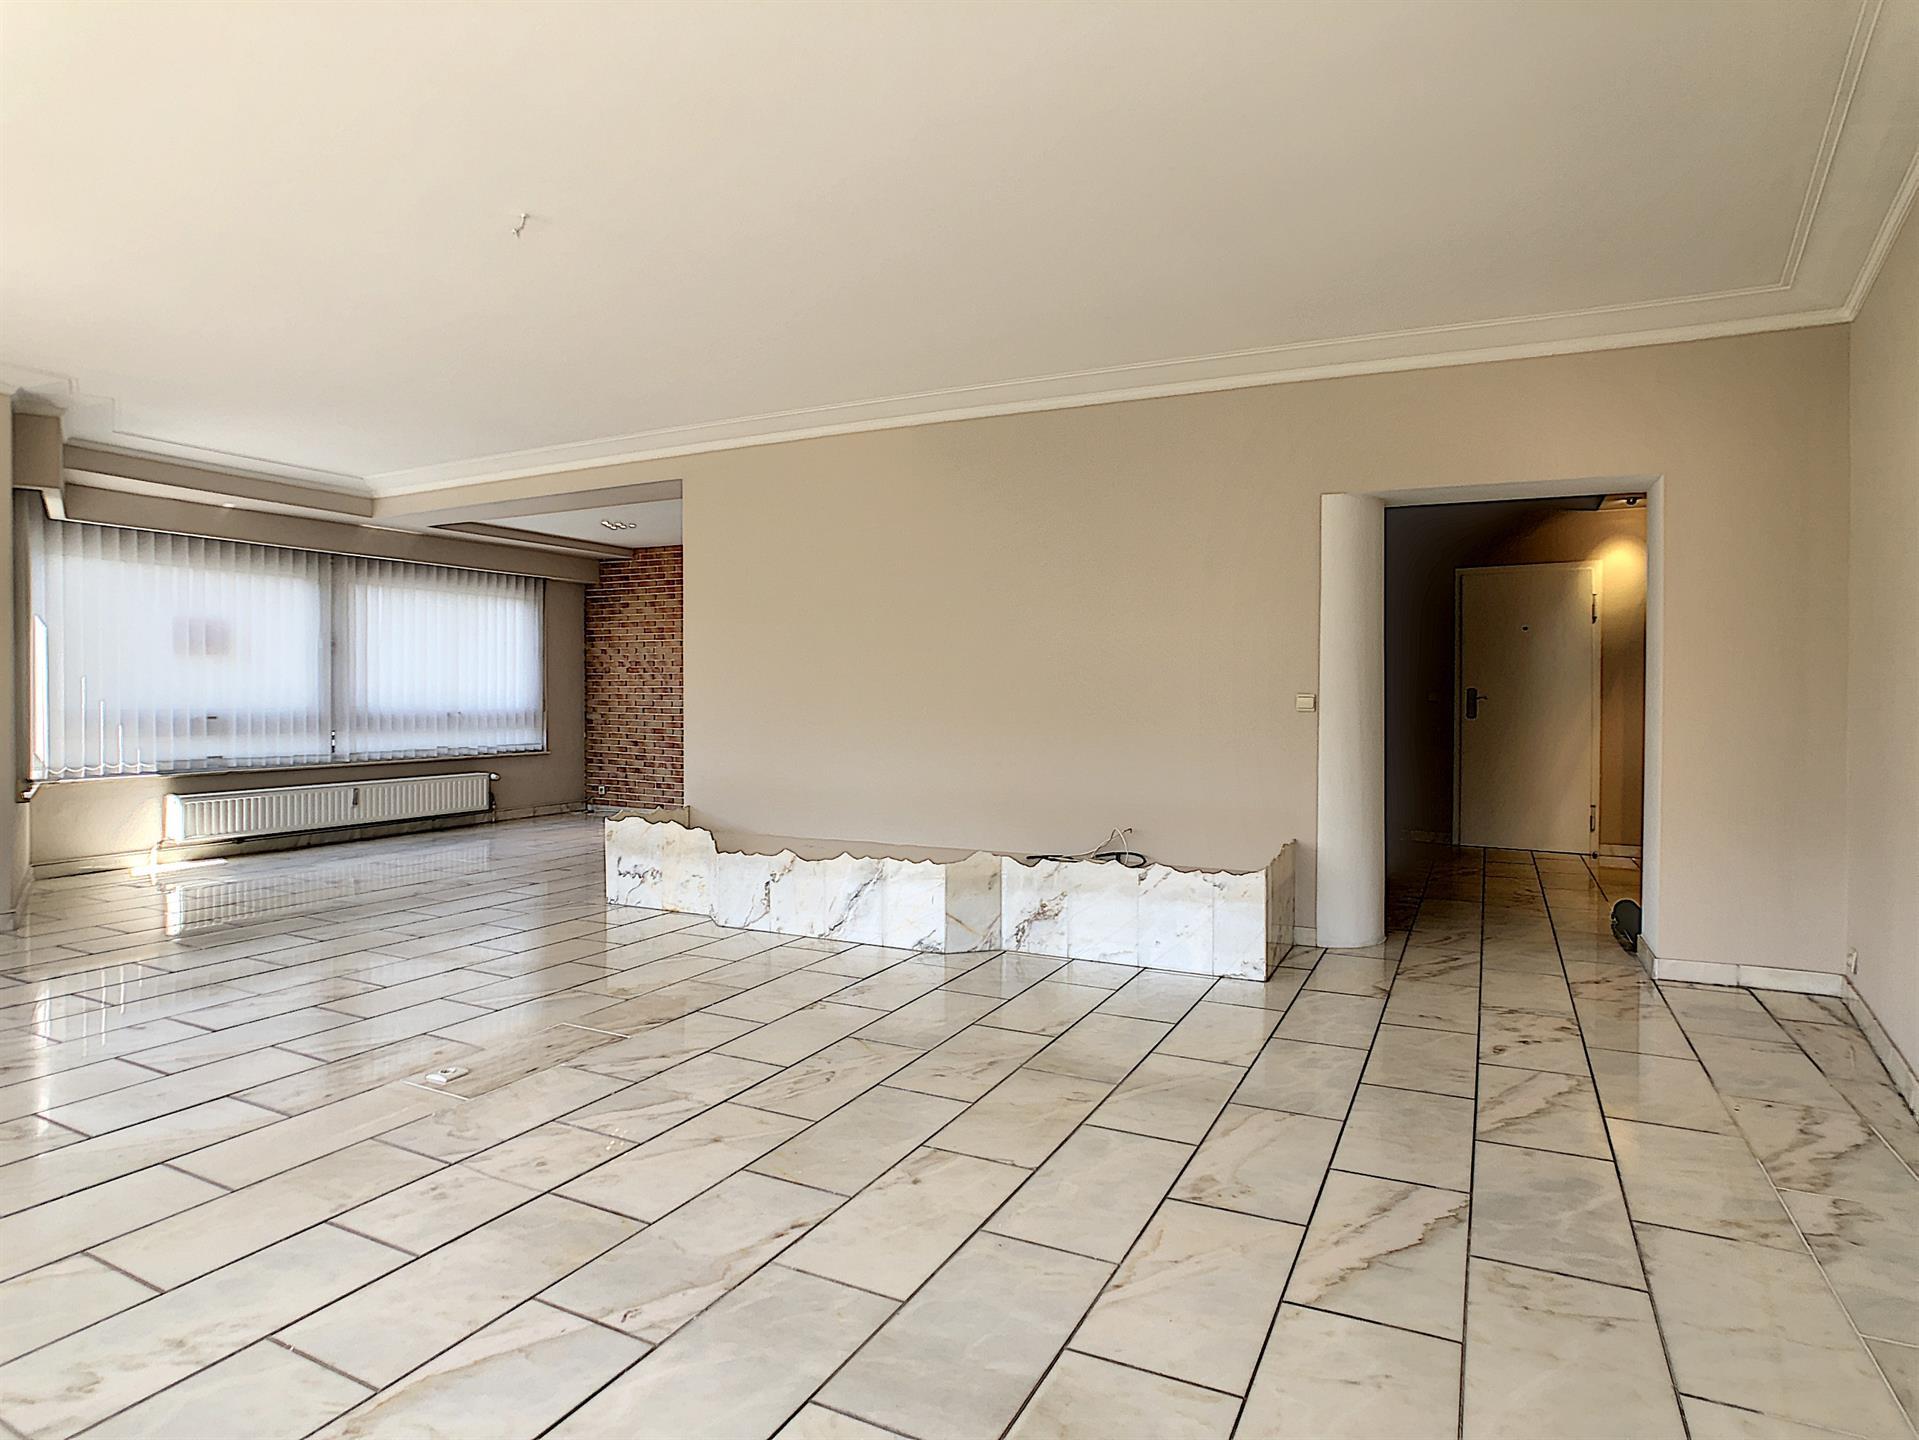 Appartement - Molenbeek-Saint-Jean - #4100298-1